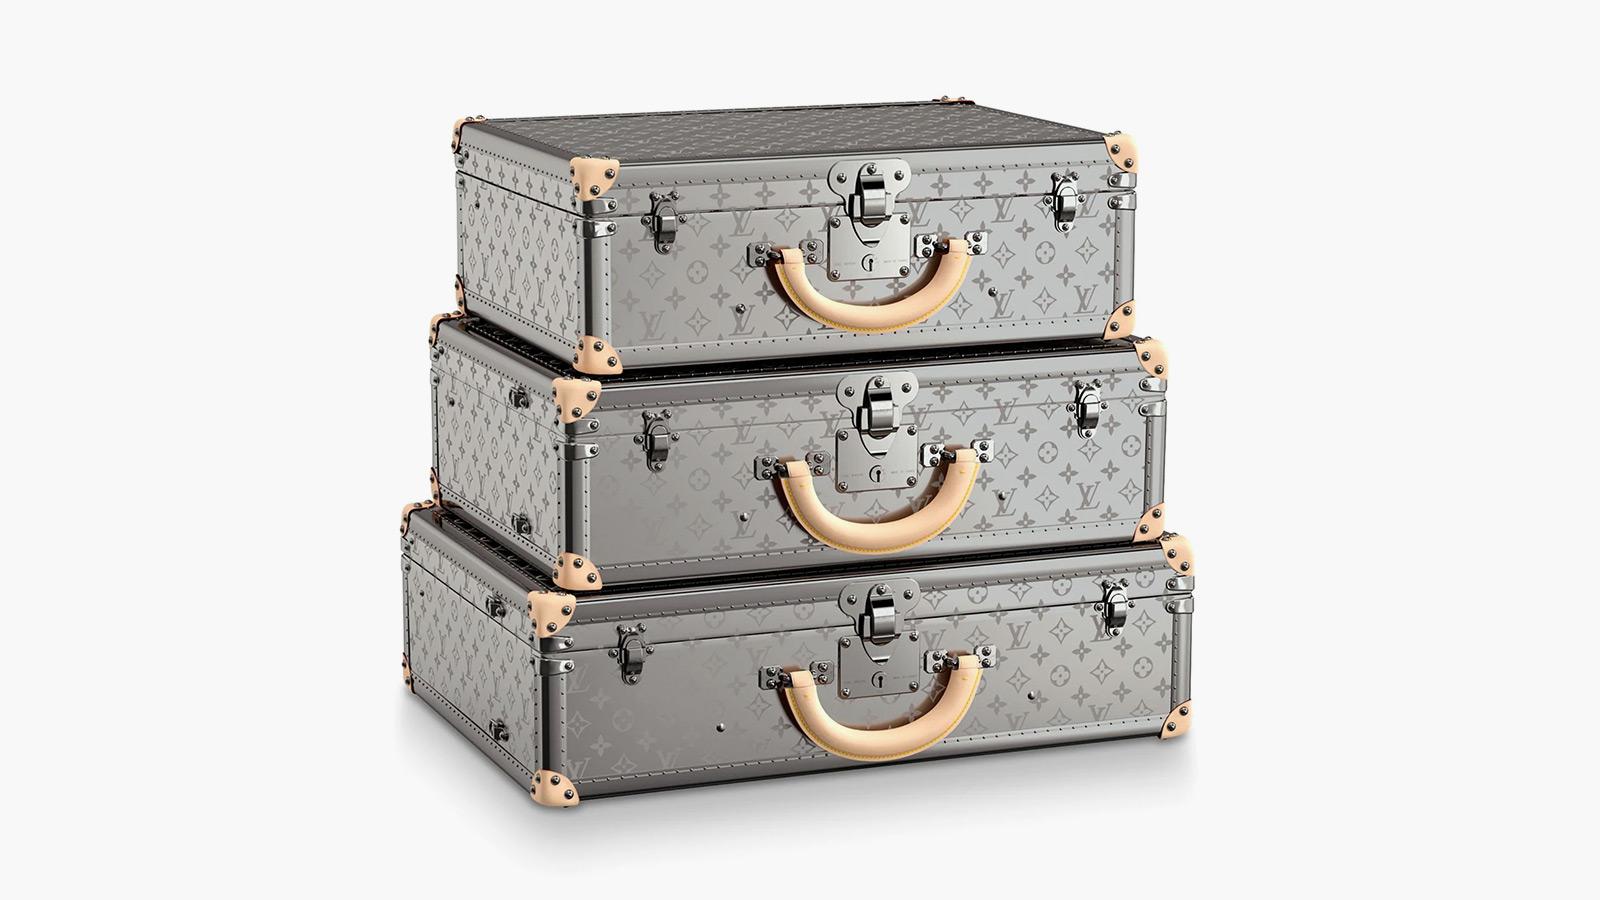 Louis Vuitton Bisten Monogram Titane Suitcase Collection